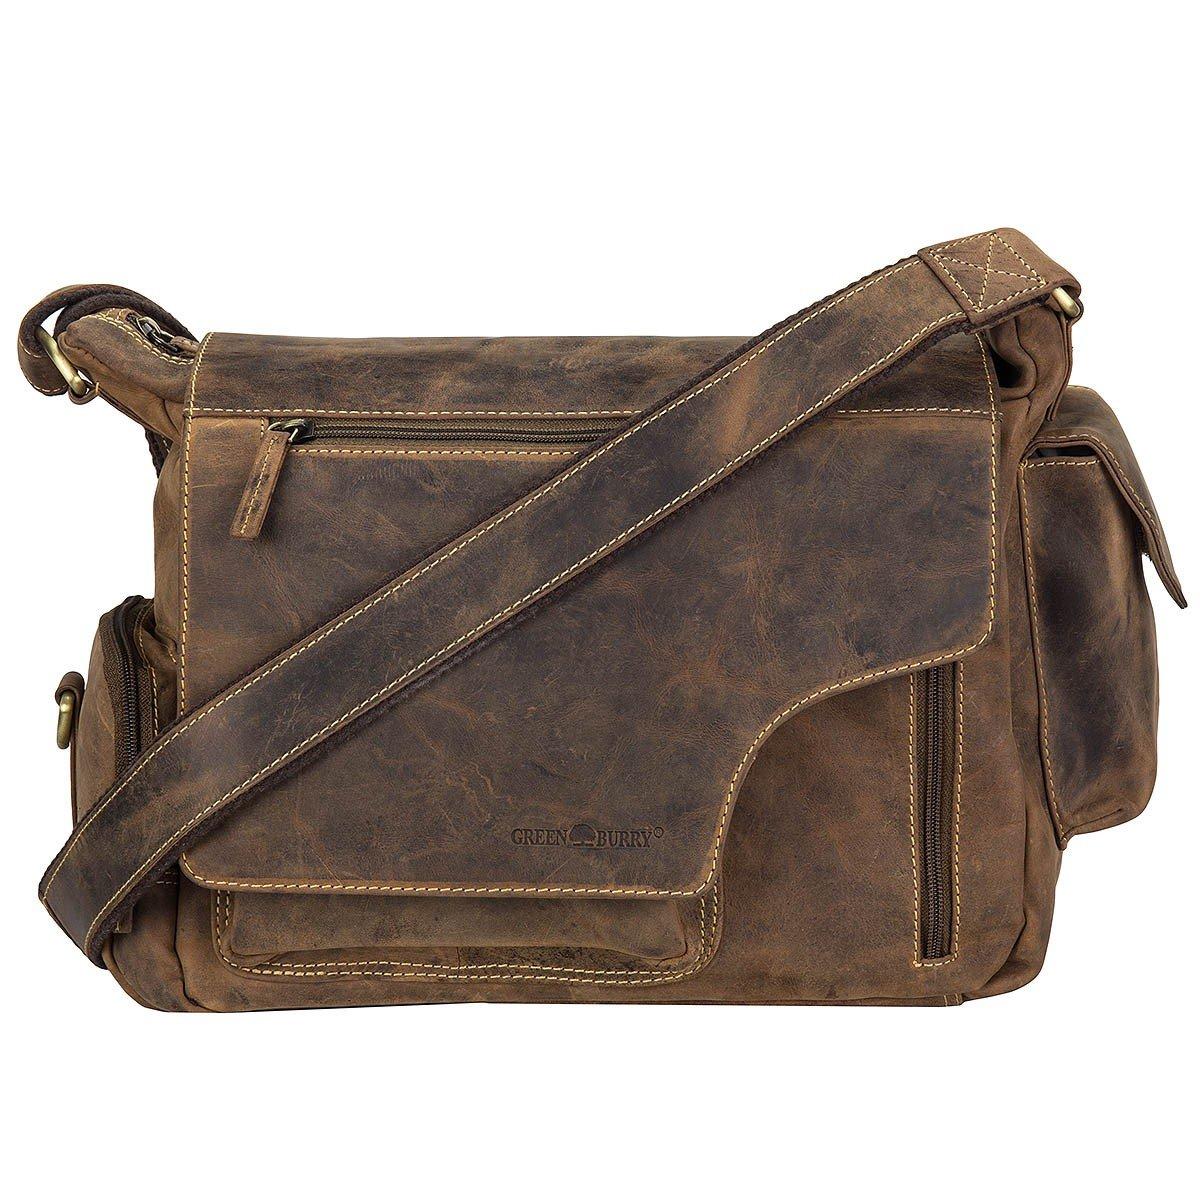 Greenburry Vintage Messenger serviette II cuir 39 cm brown